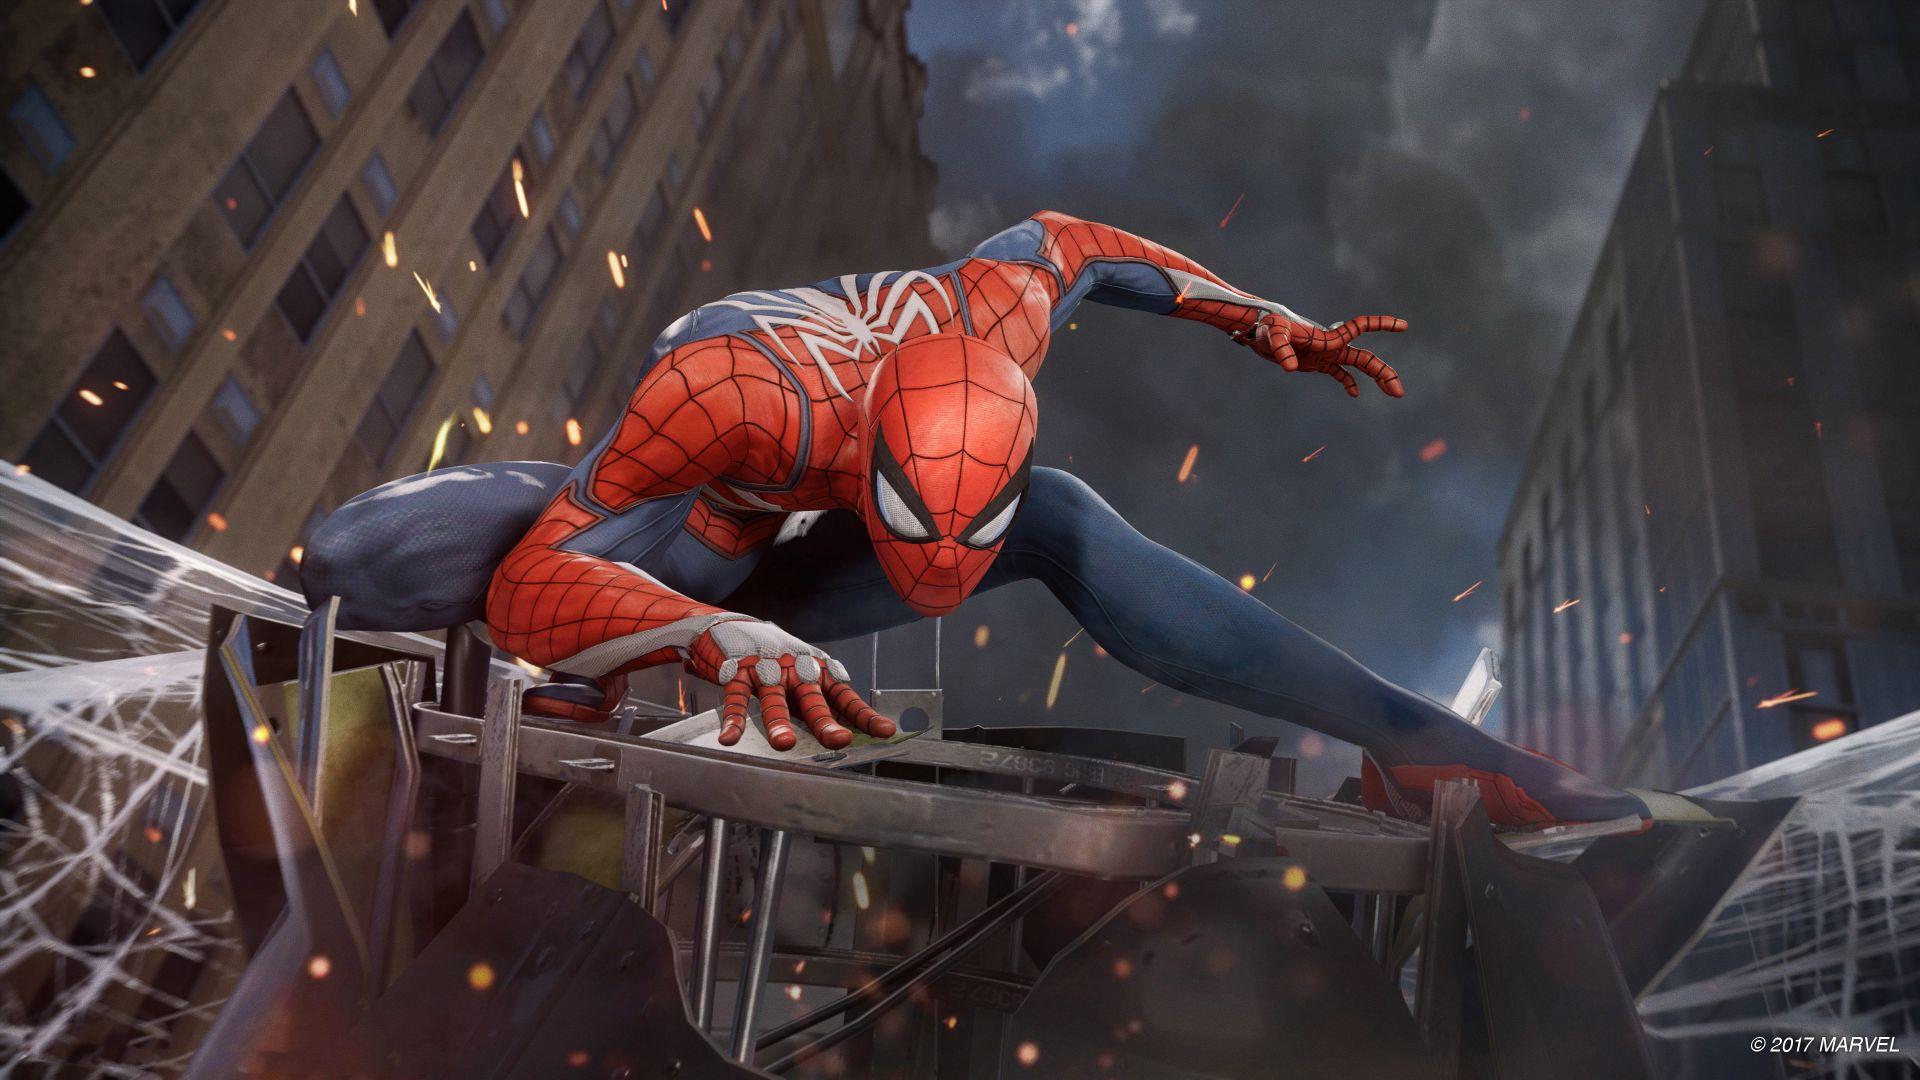 Wallpaper Spiderman PS4, 2017 video game, 4k